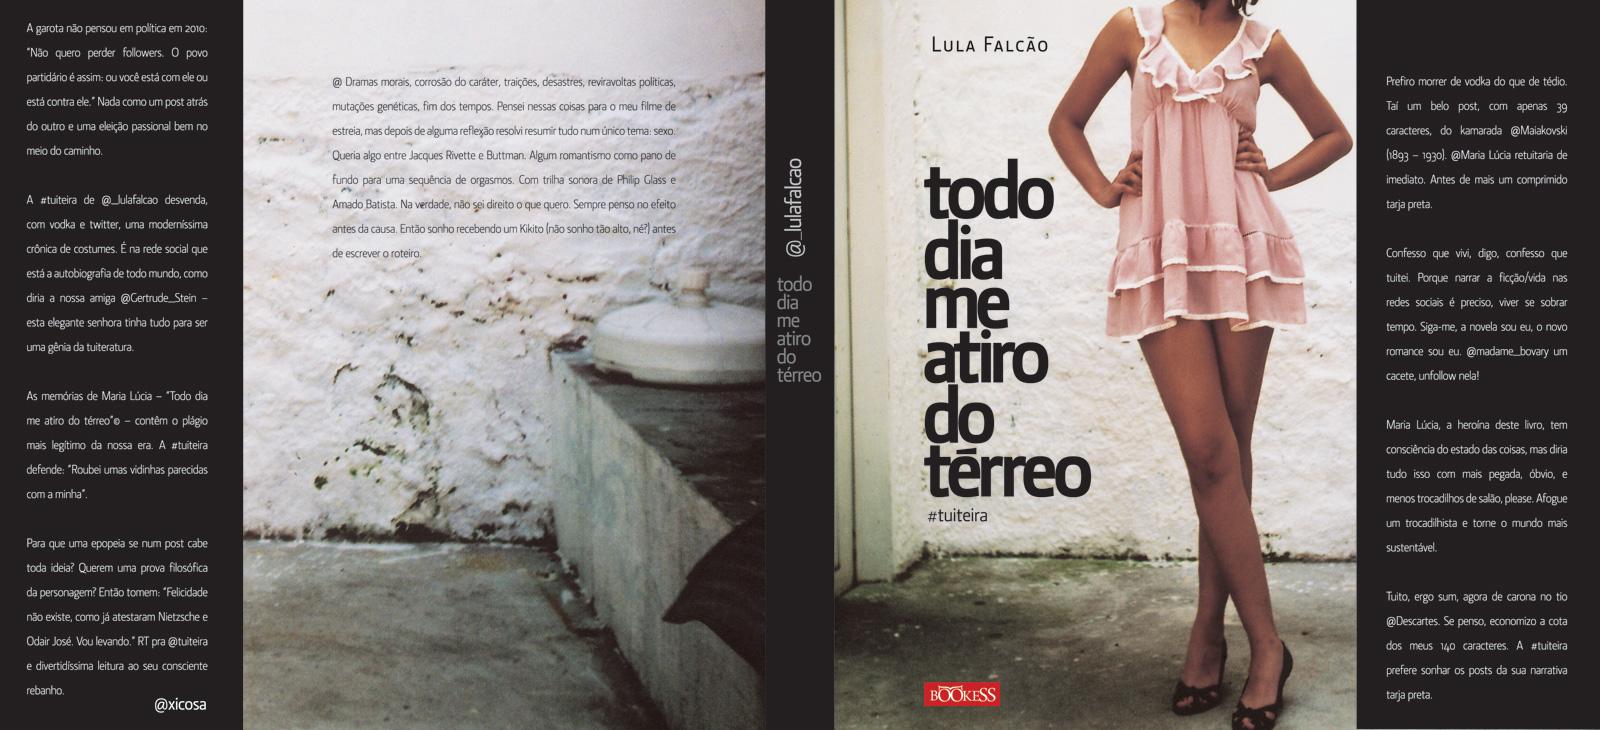 Lula_Falcao_TUITEIRA_capa_BAIXA